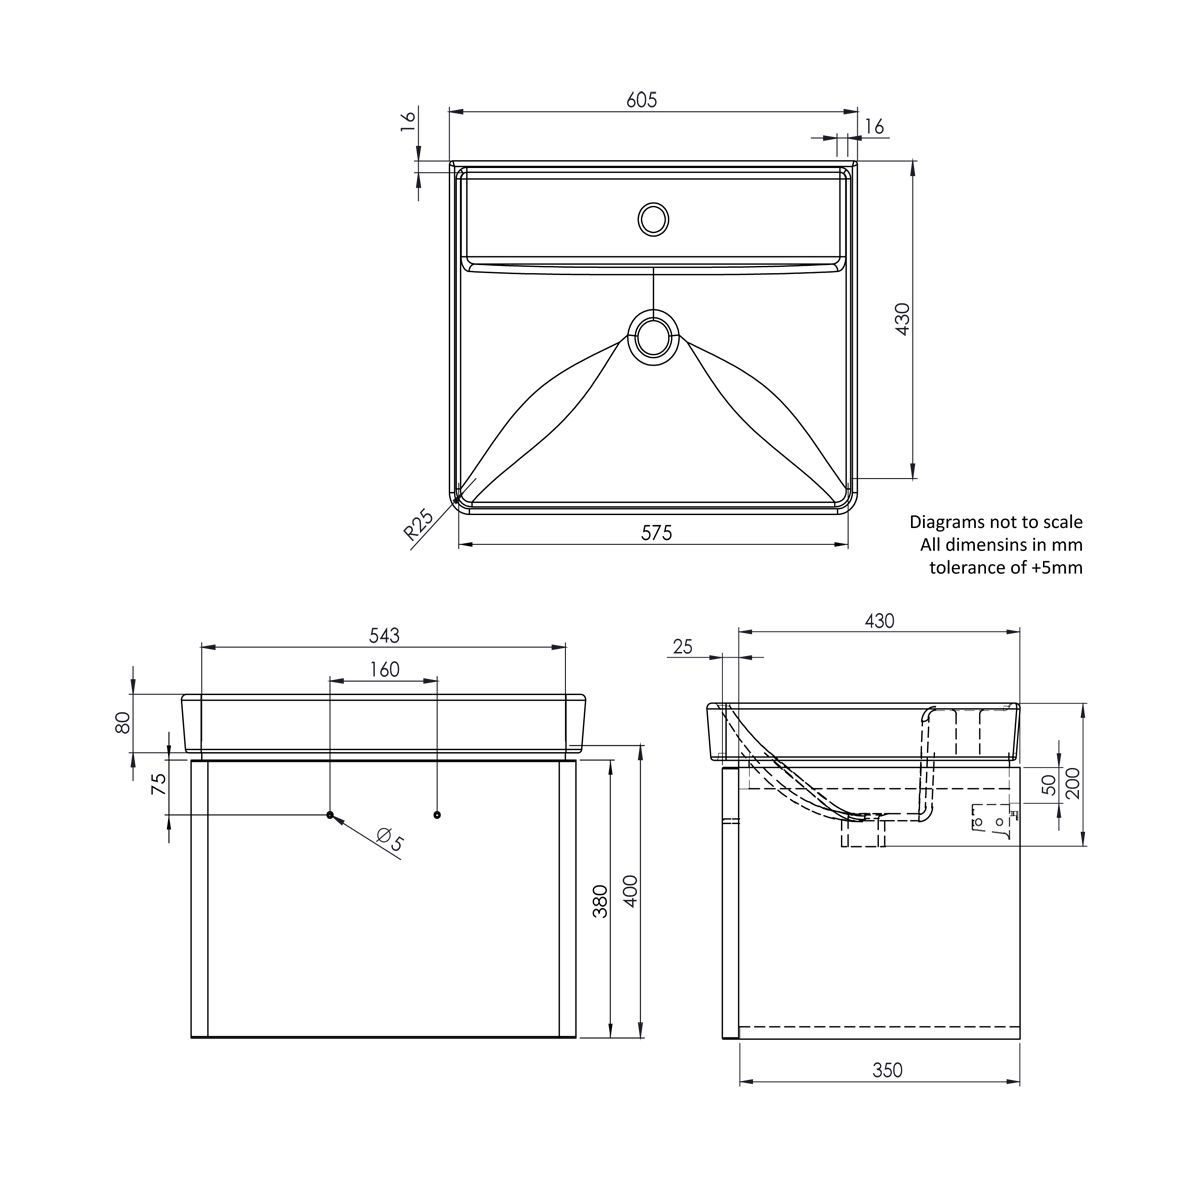 Tavistock Compass Gloss White Wall Mounted Vanity Unit 600mm Dimensions